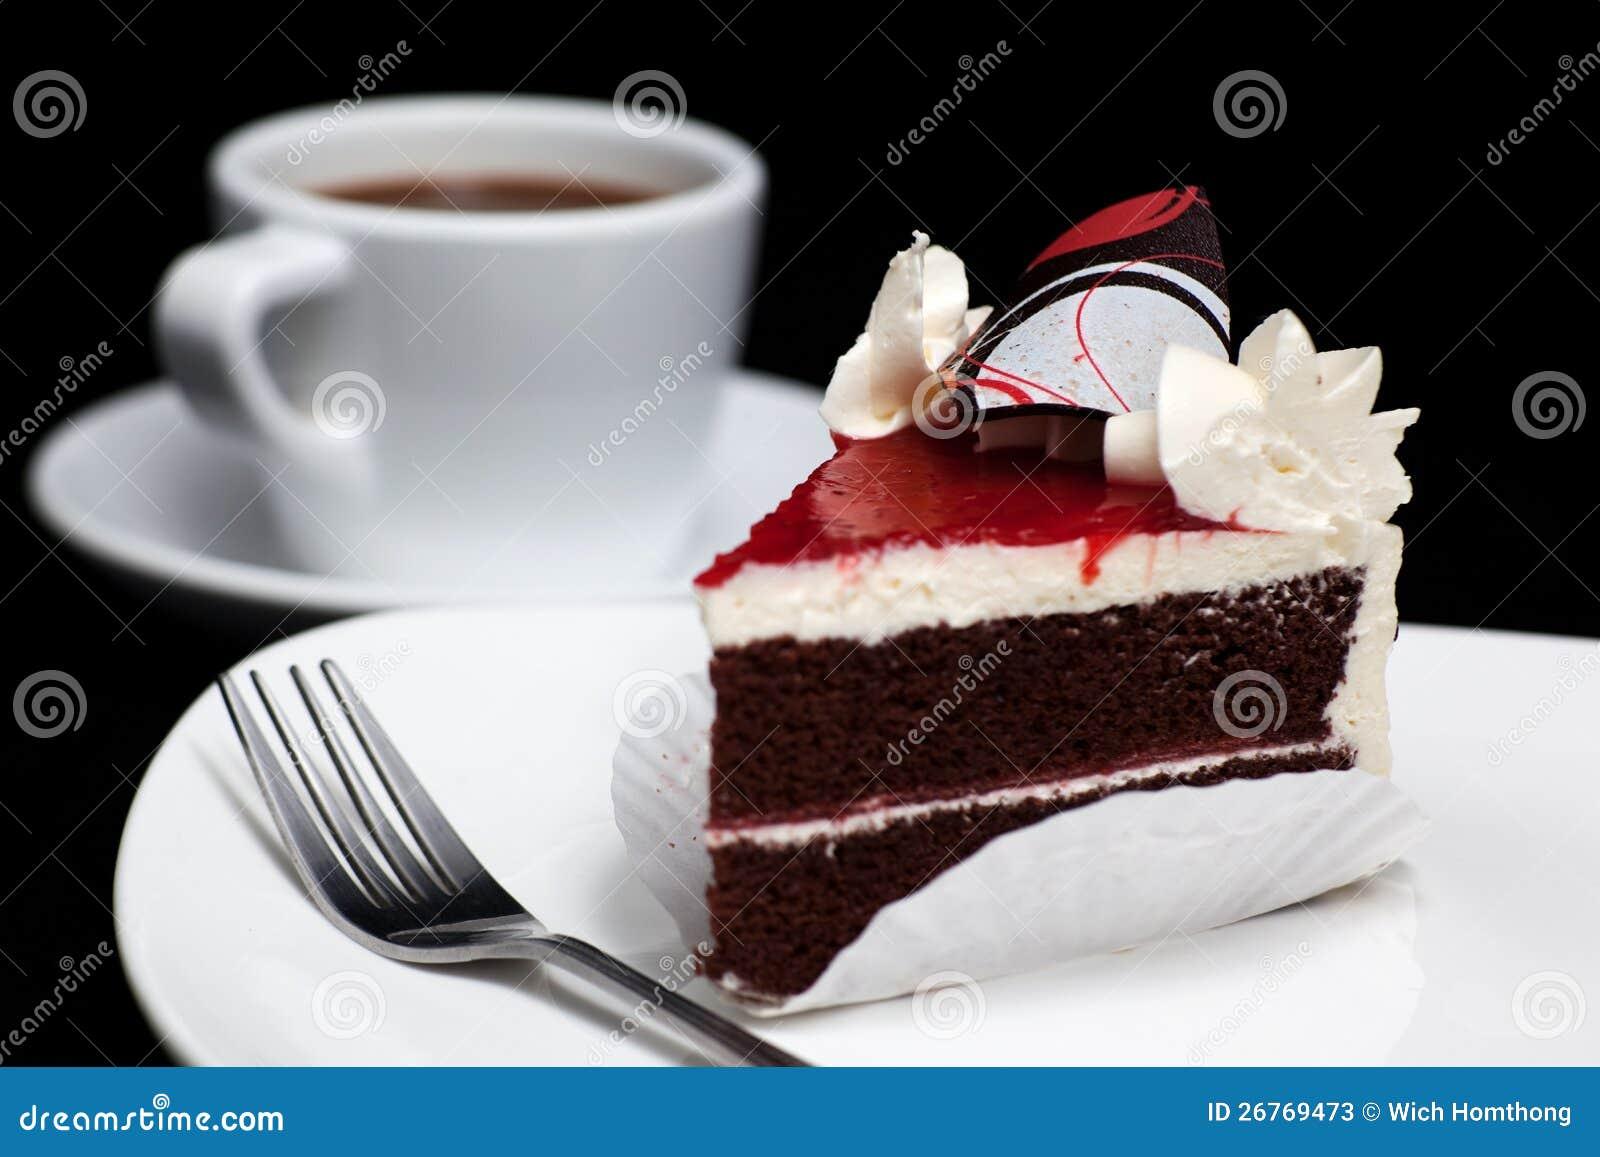 Fruit Cake Slice Images Black And White